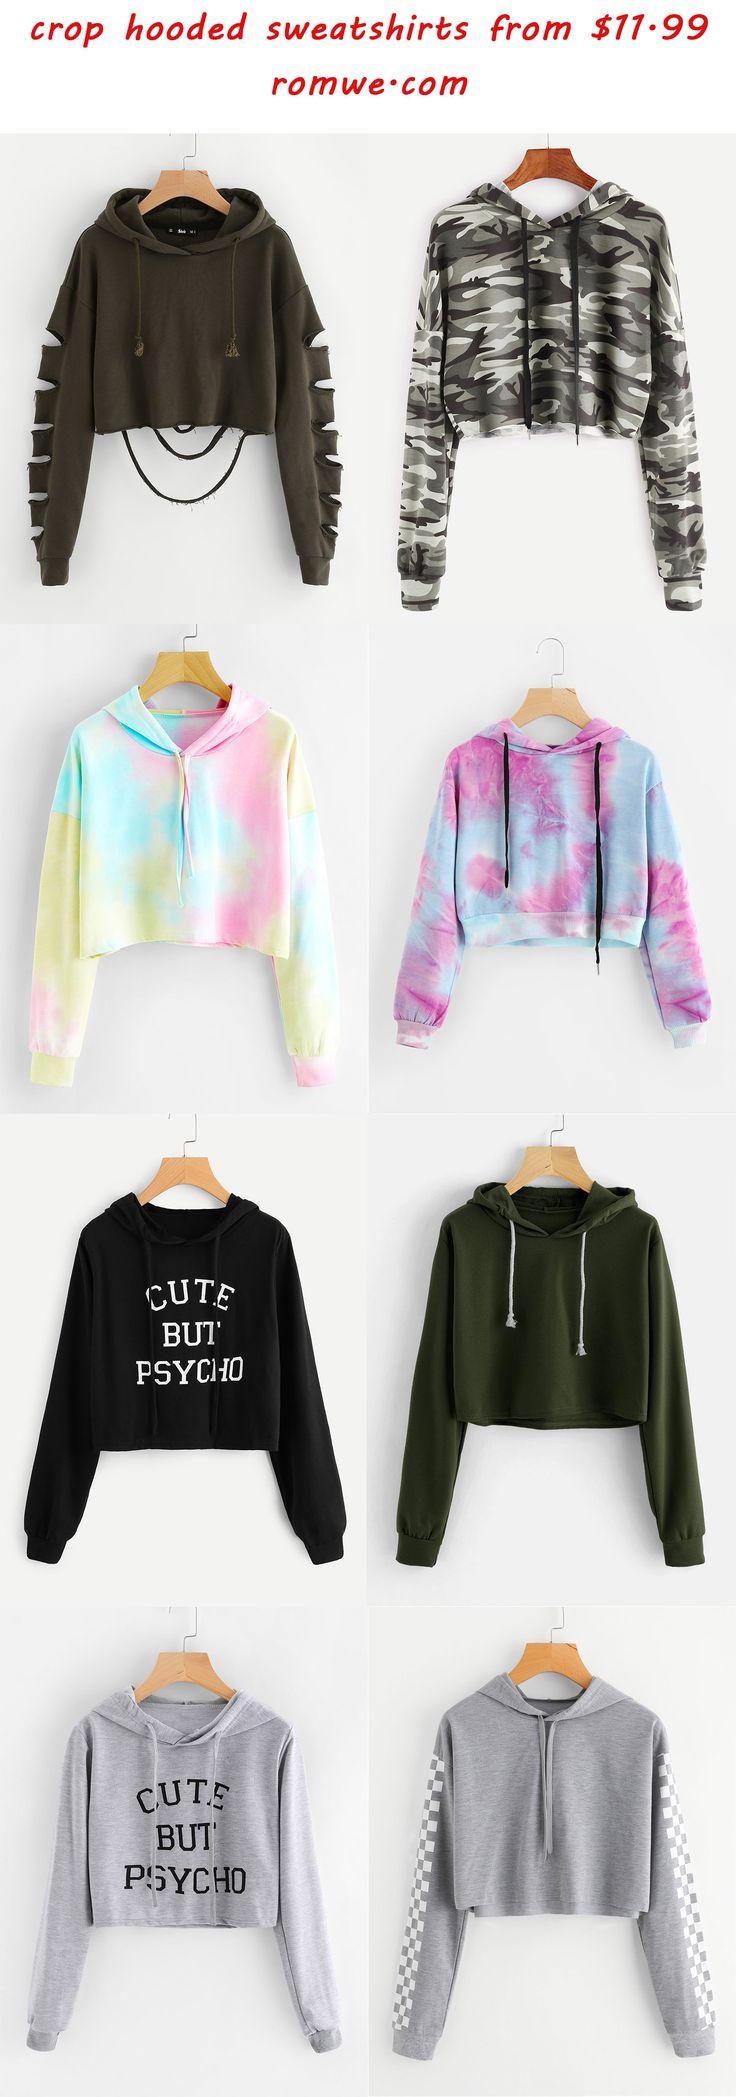 hooded crop sweatshirts 2017 - romwe.com